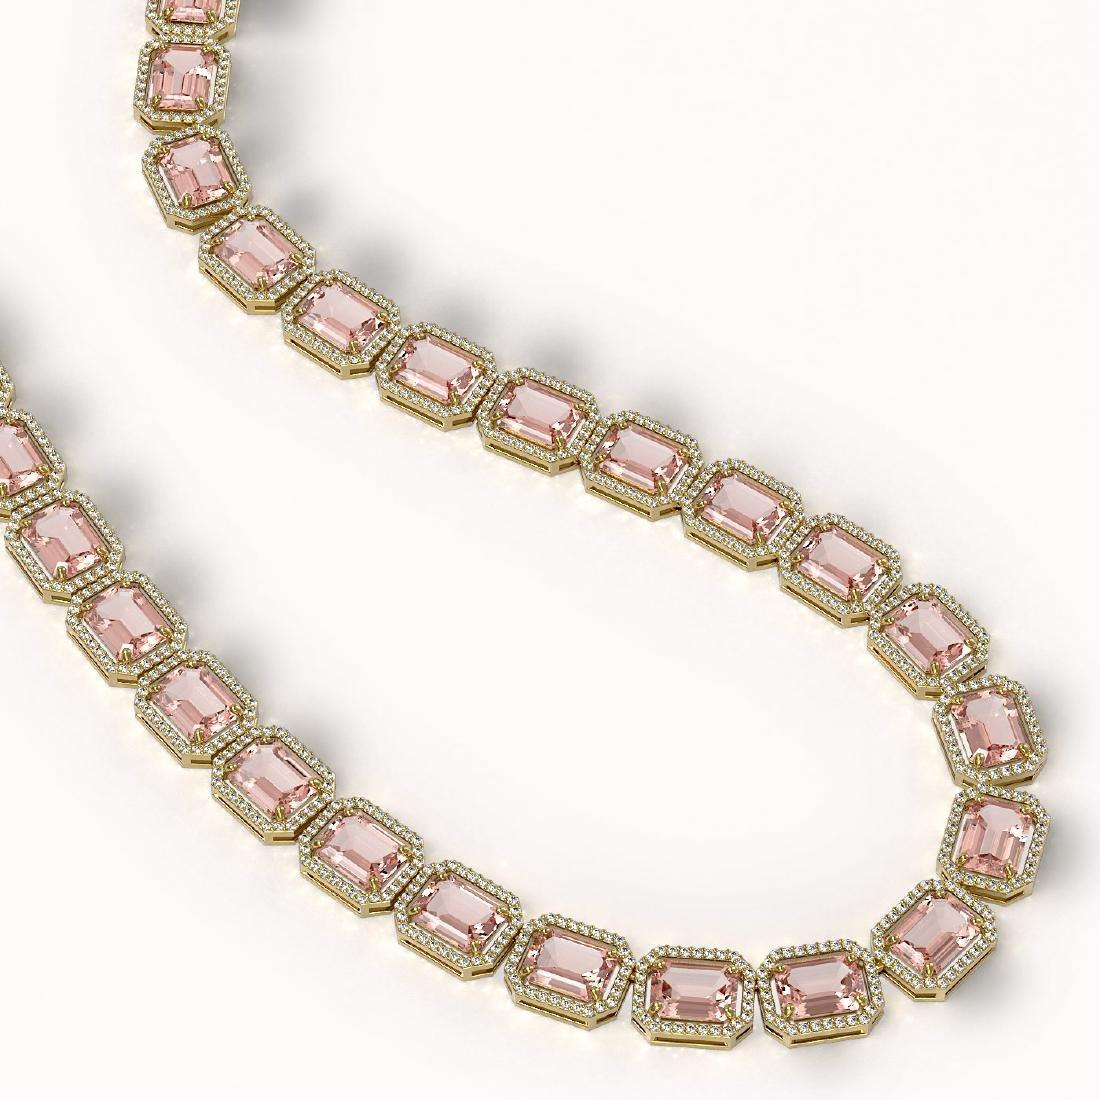 81.64 CTW Morganite & Diamond Halo Necklace 10K Yellow